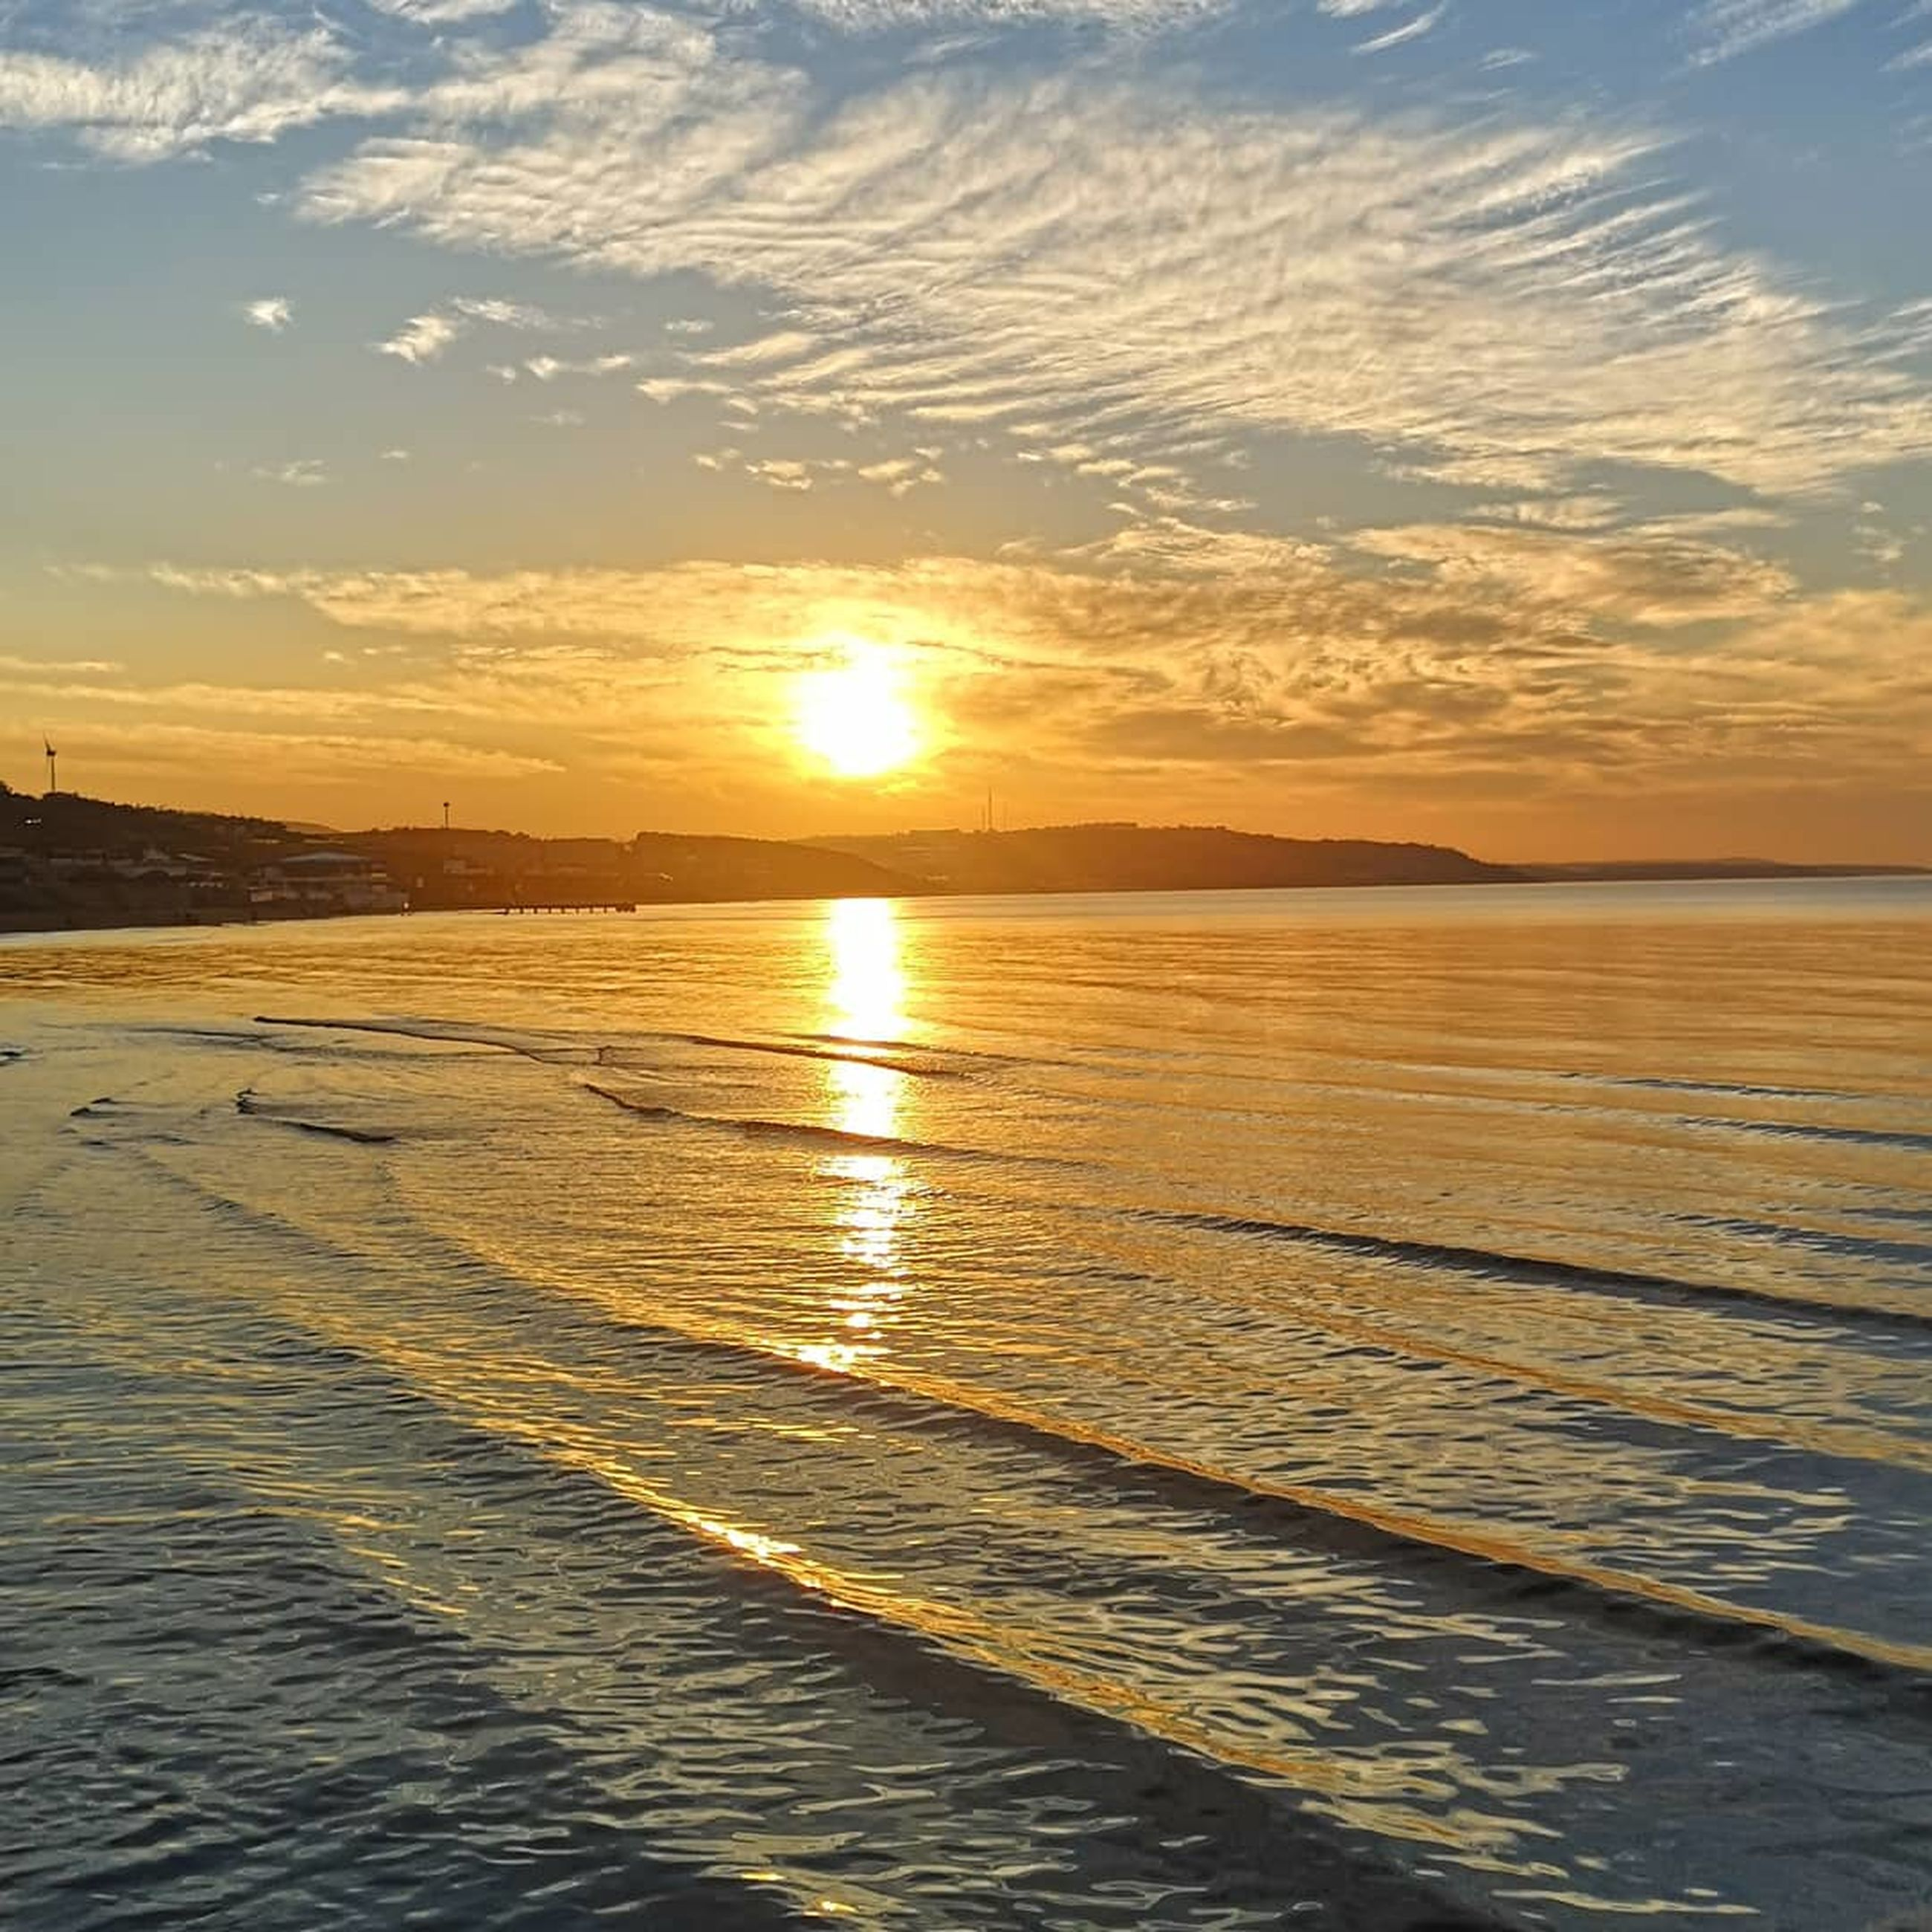 sunset, sky, water, scenics - nature, sea, beauty in nature, tranquility, cloud - sky, tranquil scene, horizon, horizon over water, orange color, idyllic, nature, land, sun, beach, sunlight, no people, outdoors